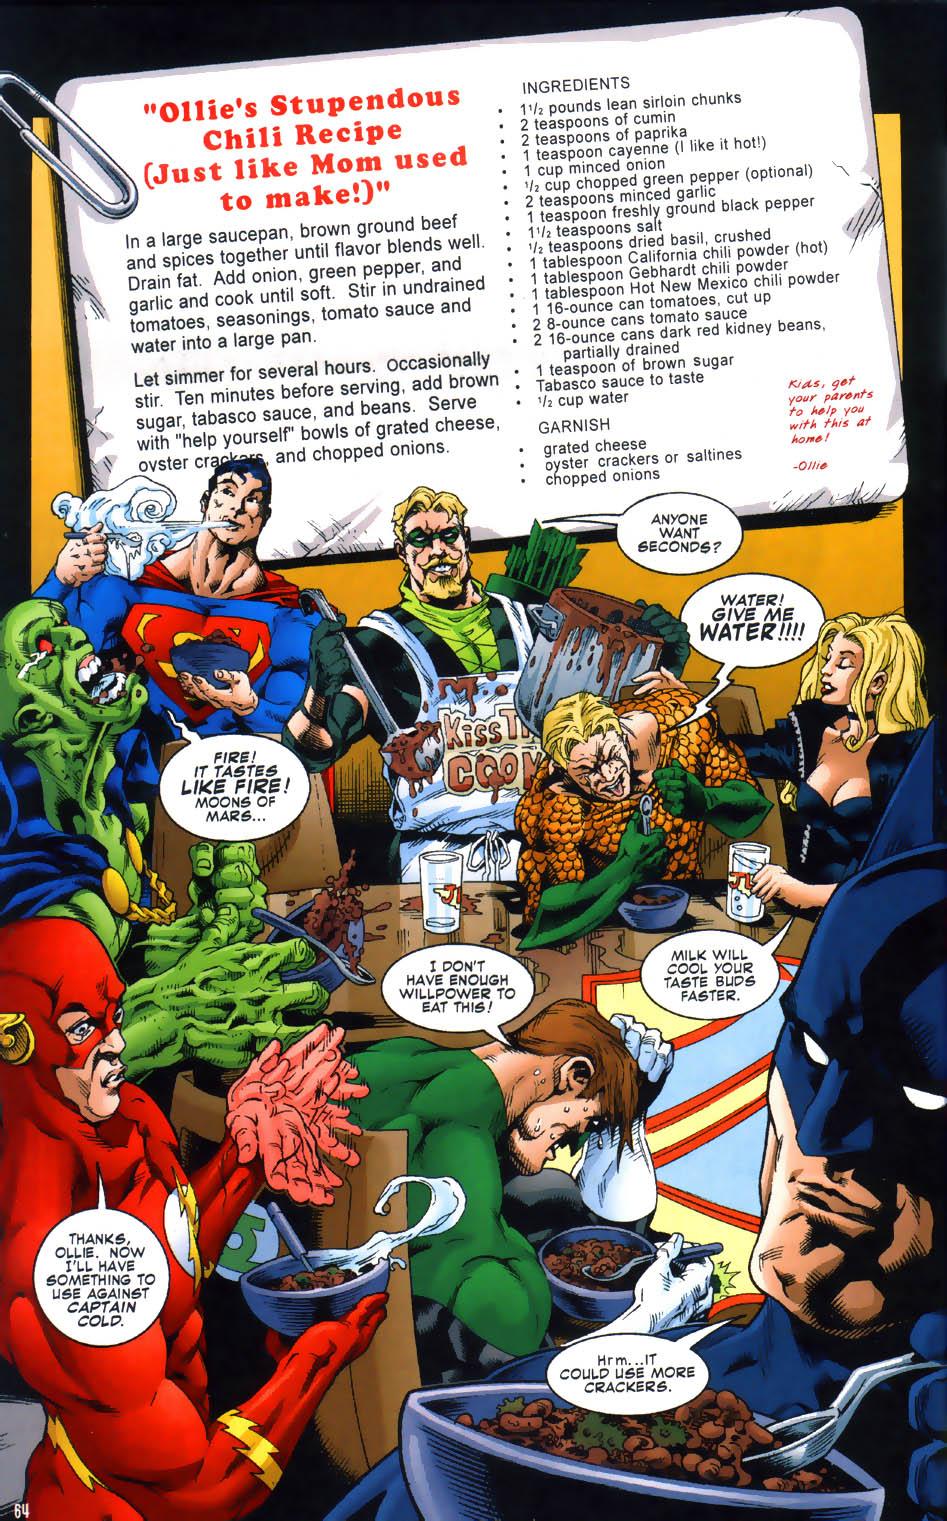 Worksh3d: Green Arrow's Chili